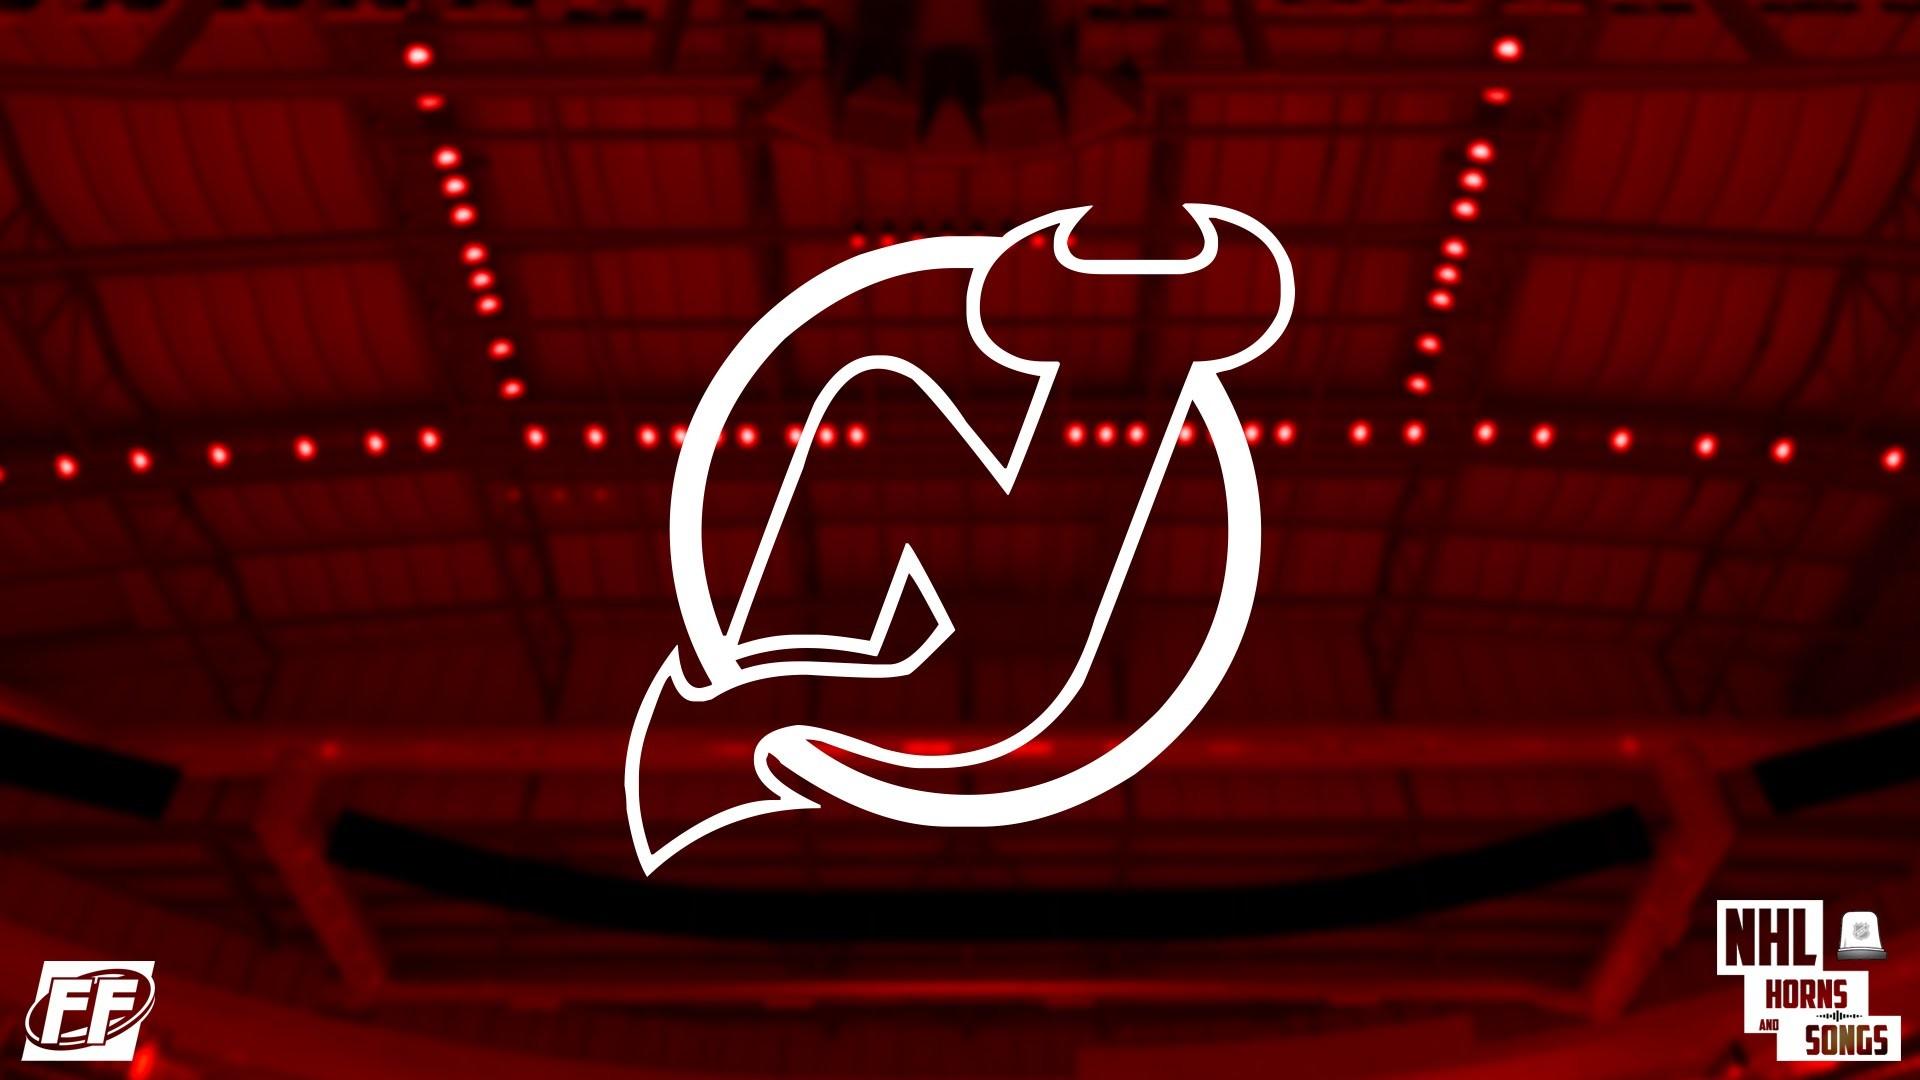 nhl new jersey devils wallpaper New Jersey Devils 2014 2015 Goal Horn  YouTube